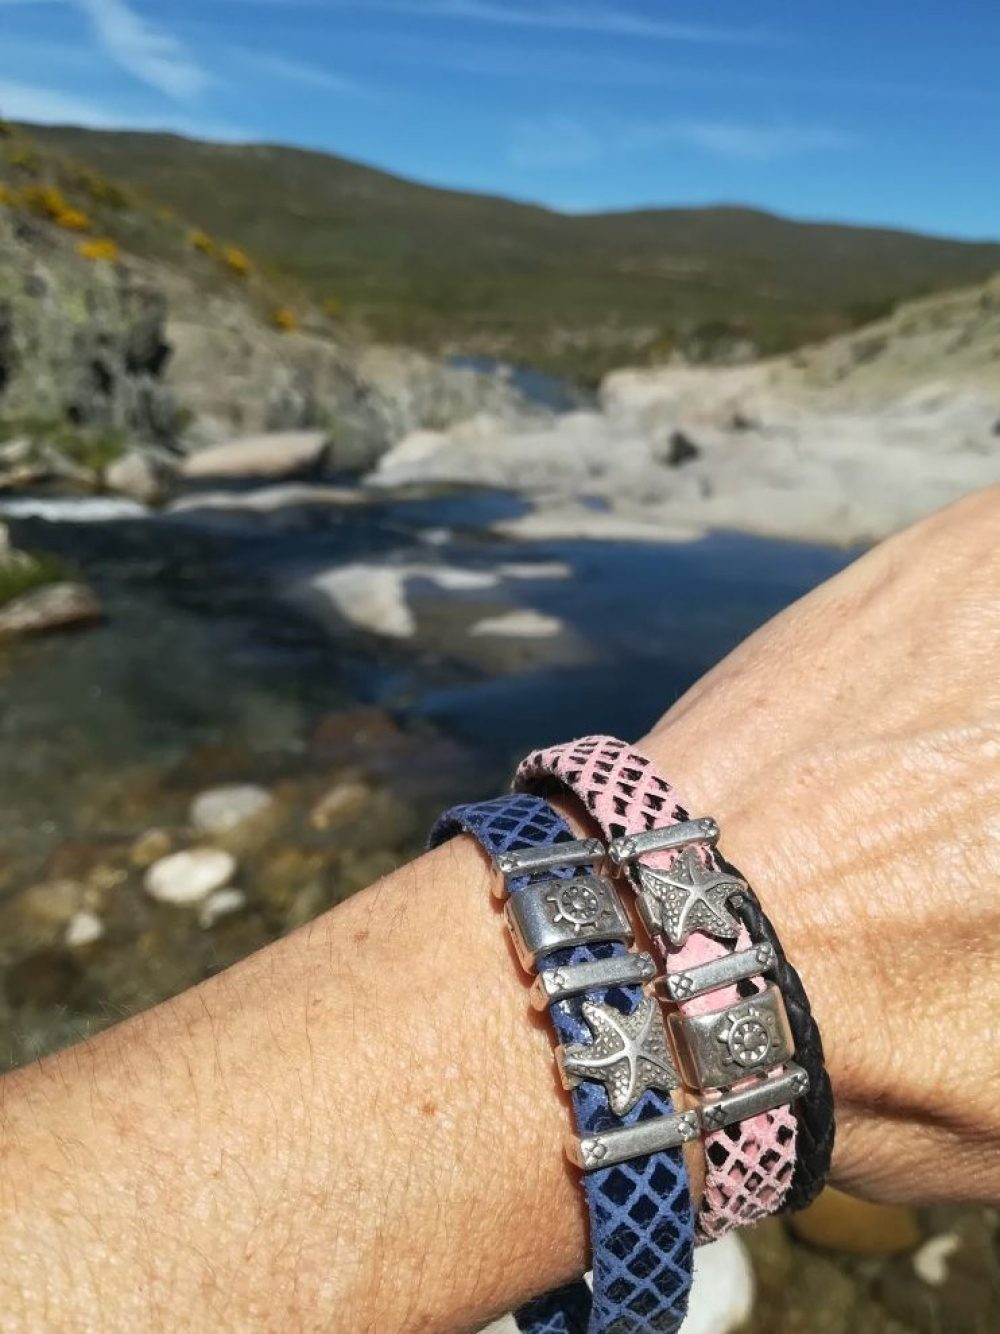 pulsera artesanal piel rosa con ancla, pulsera artesana cuero imitacion reptil, brazalete artesano con estrella mar, pulsera nautica de piel artesanal leonika piel (3)